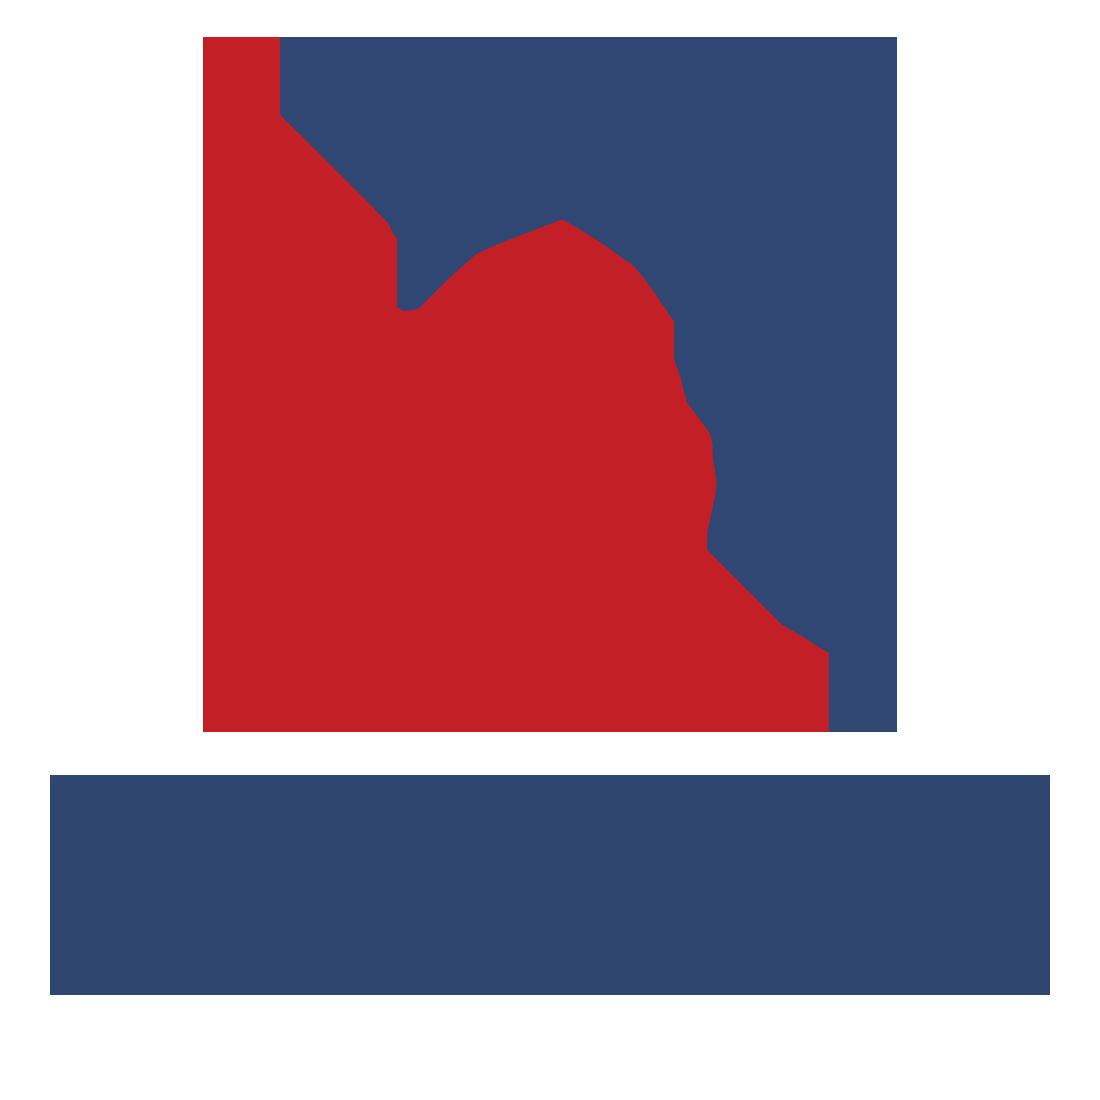 CVETS - Columbia Veterinary Emergency Trauma and Specialty image 3